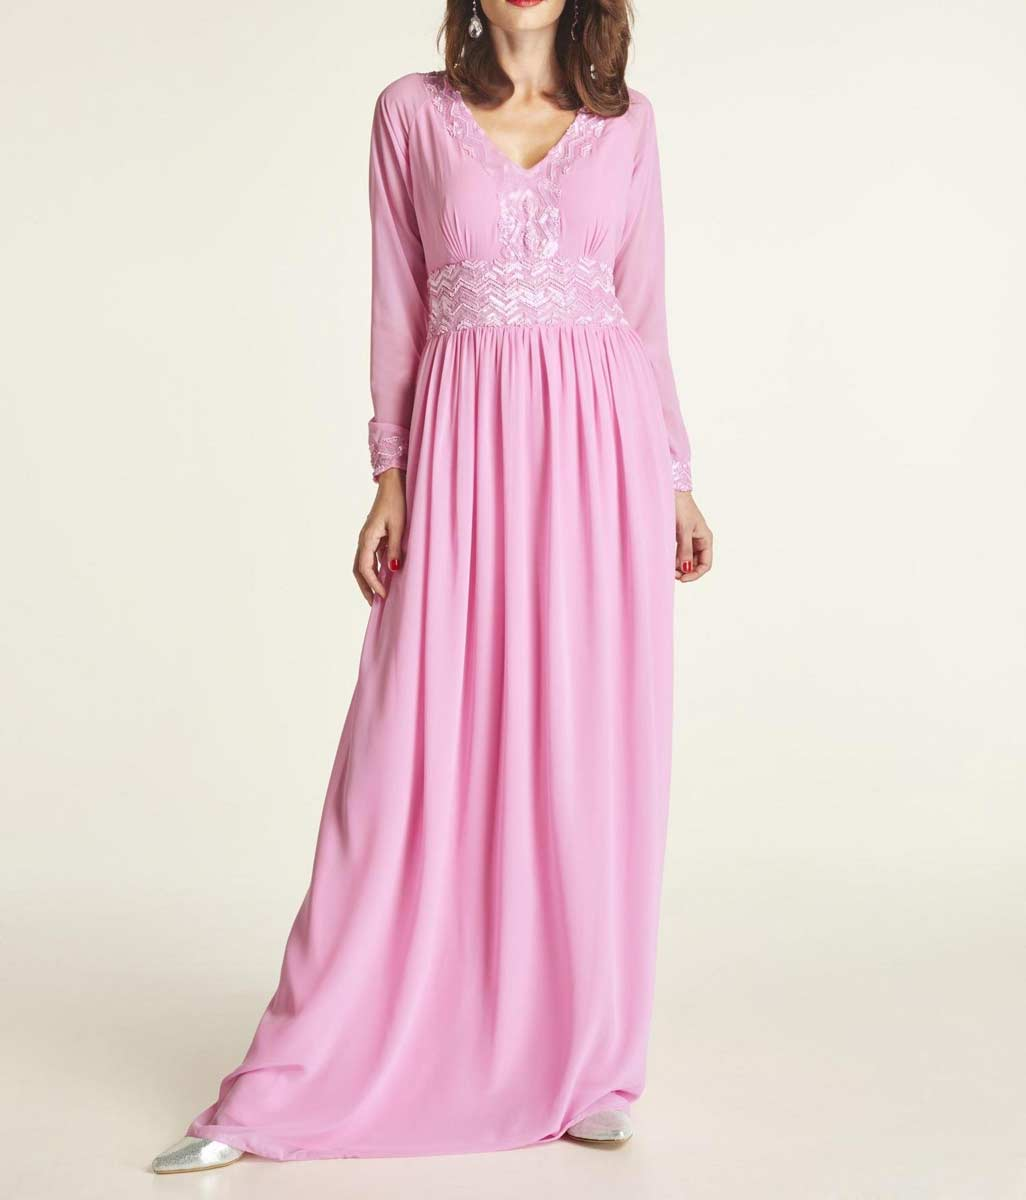 Festmoden Heine Abendkleid lang, pink 516.059 516.059 Missforty